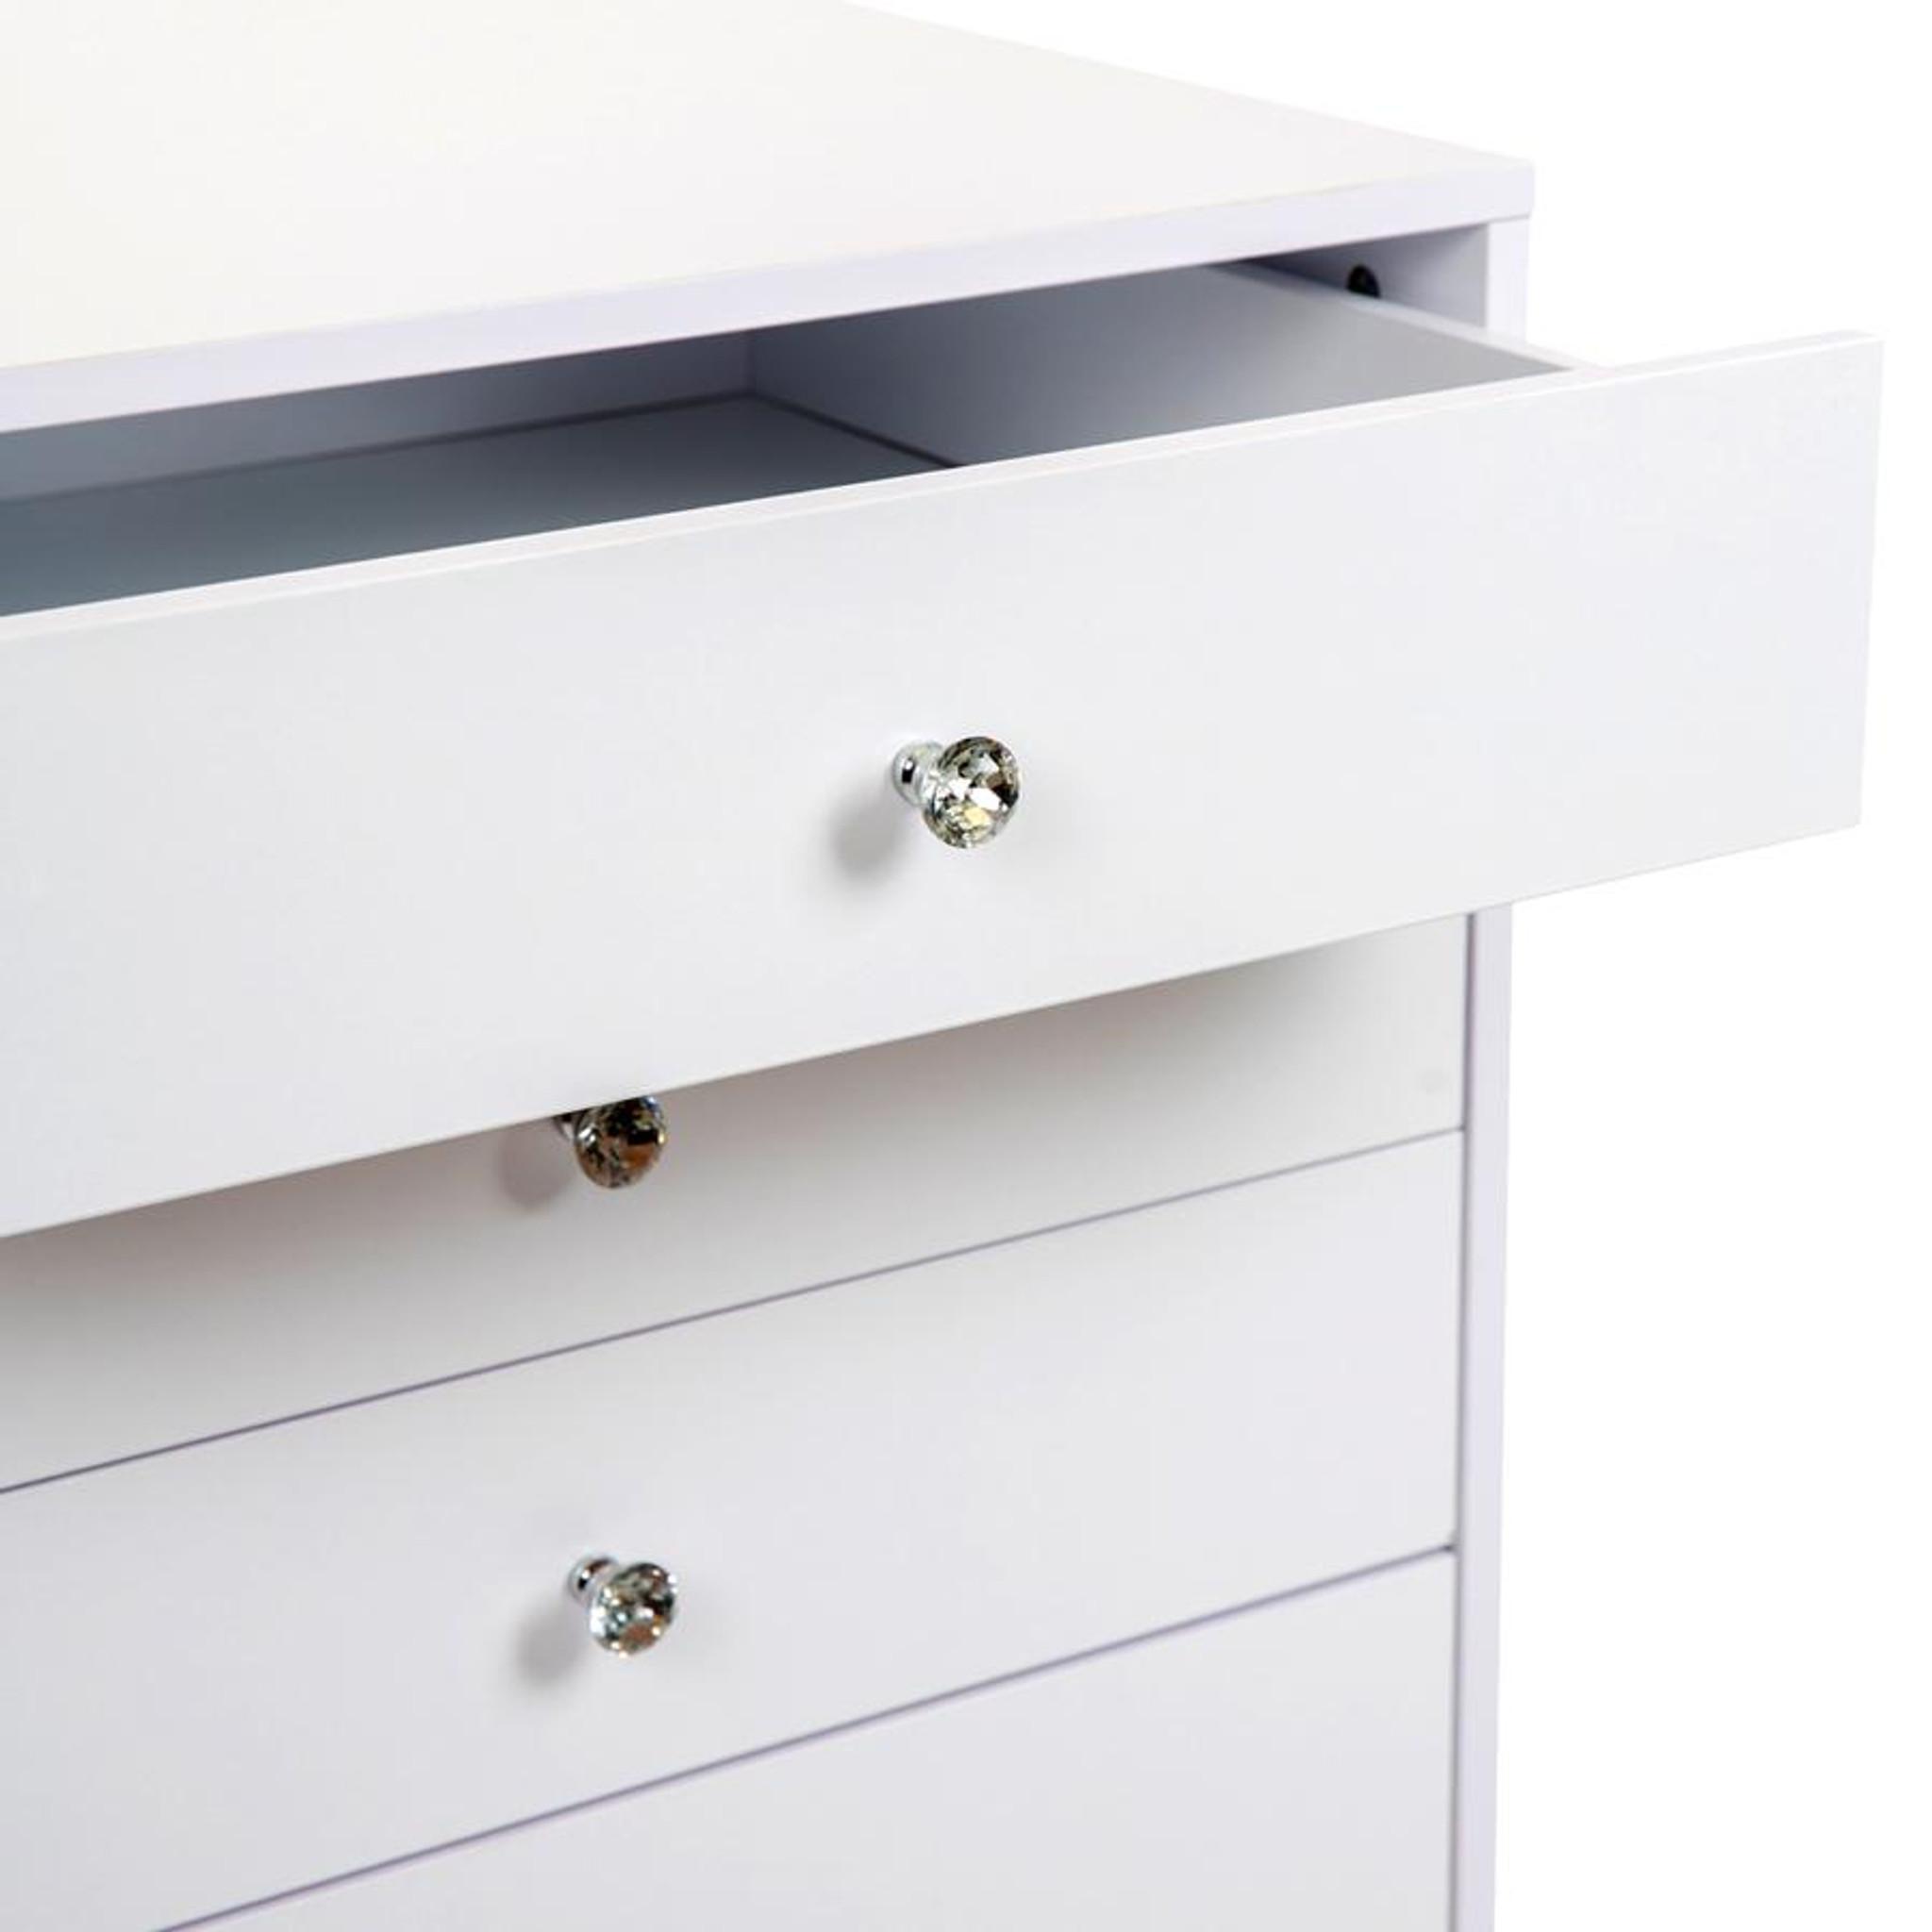 SLAYSTATION® PLUS PREMIUM VANITY TABLE WITH DRAWERS white glass top multi drawer storage vanity dressing table